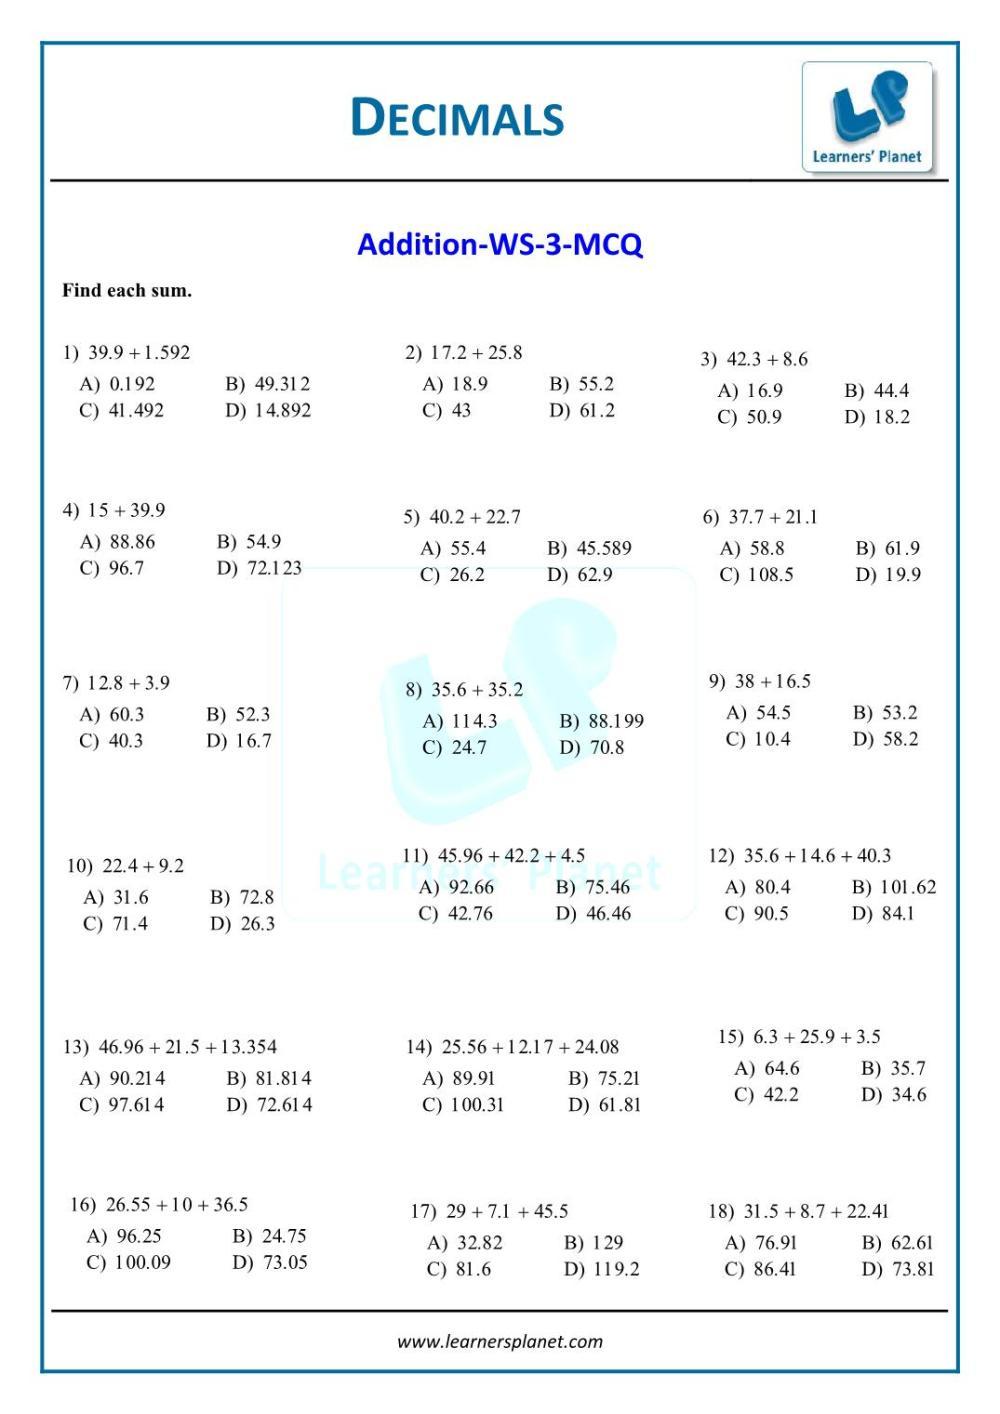 medium resolution of Class vi ncert solution decimals interactive quiz